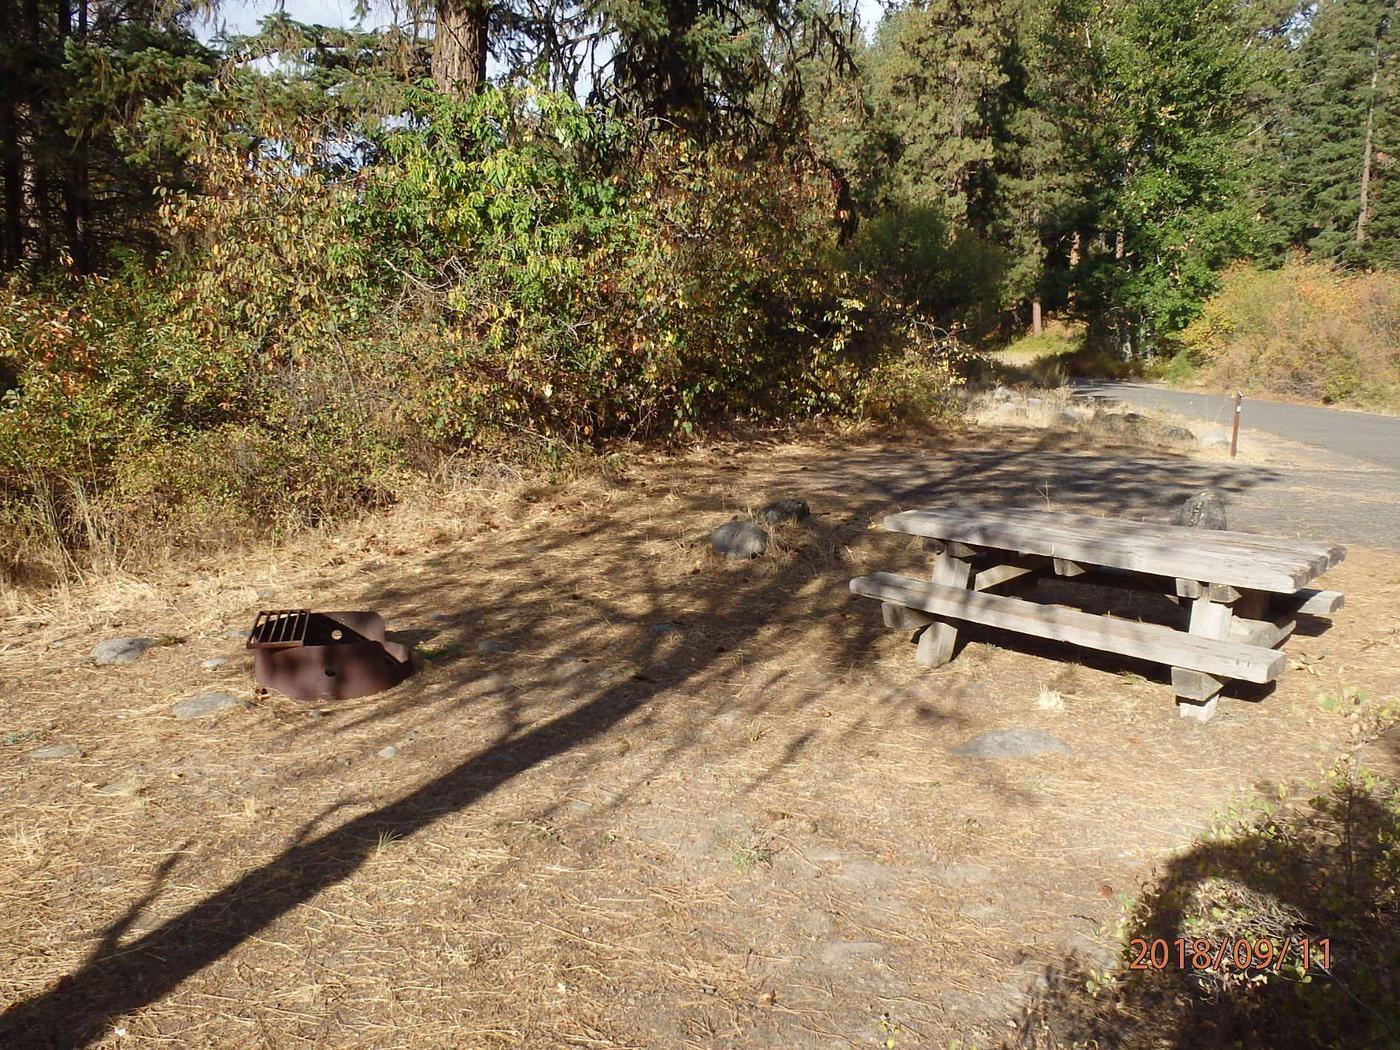 Hause Creek CampgroundCamp Unit 4